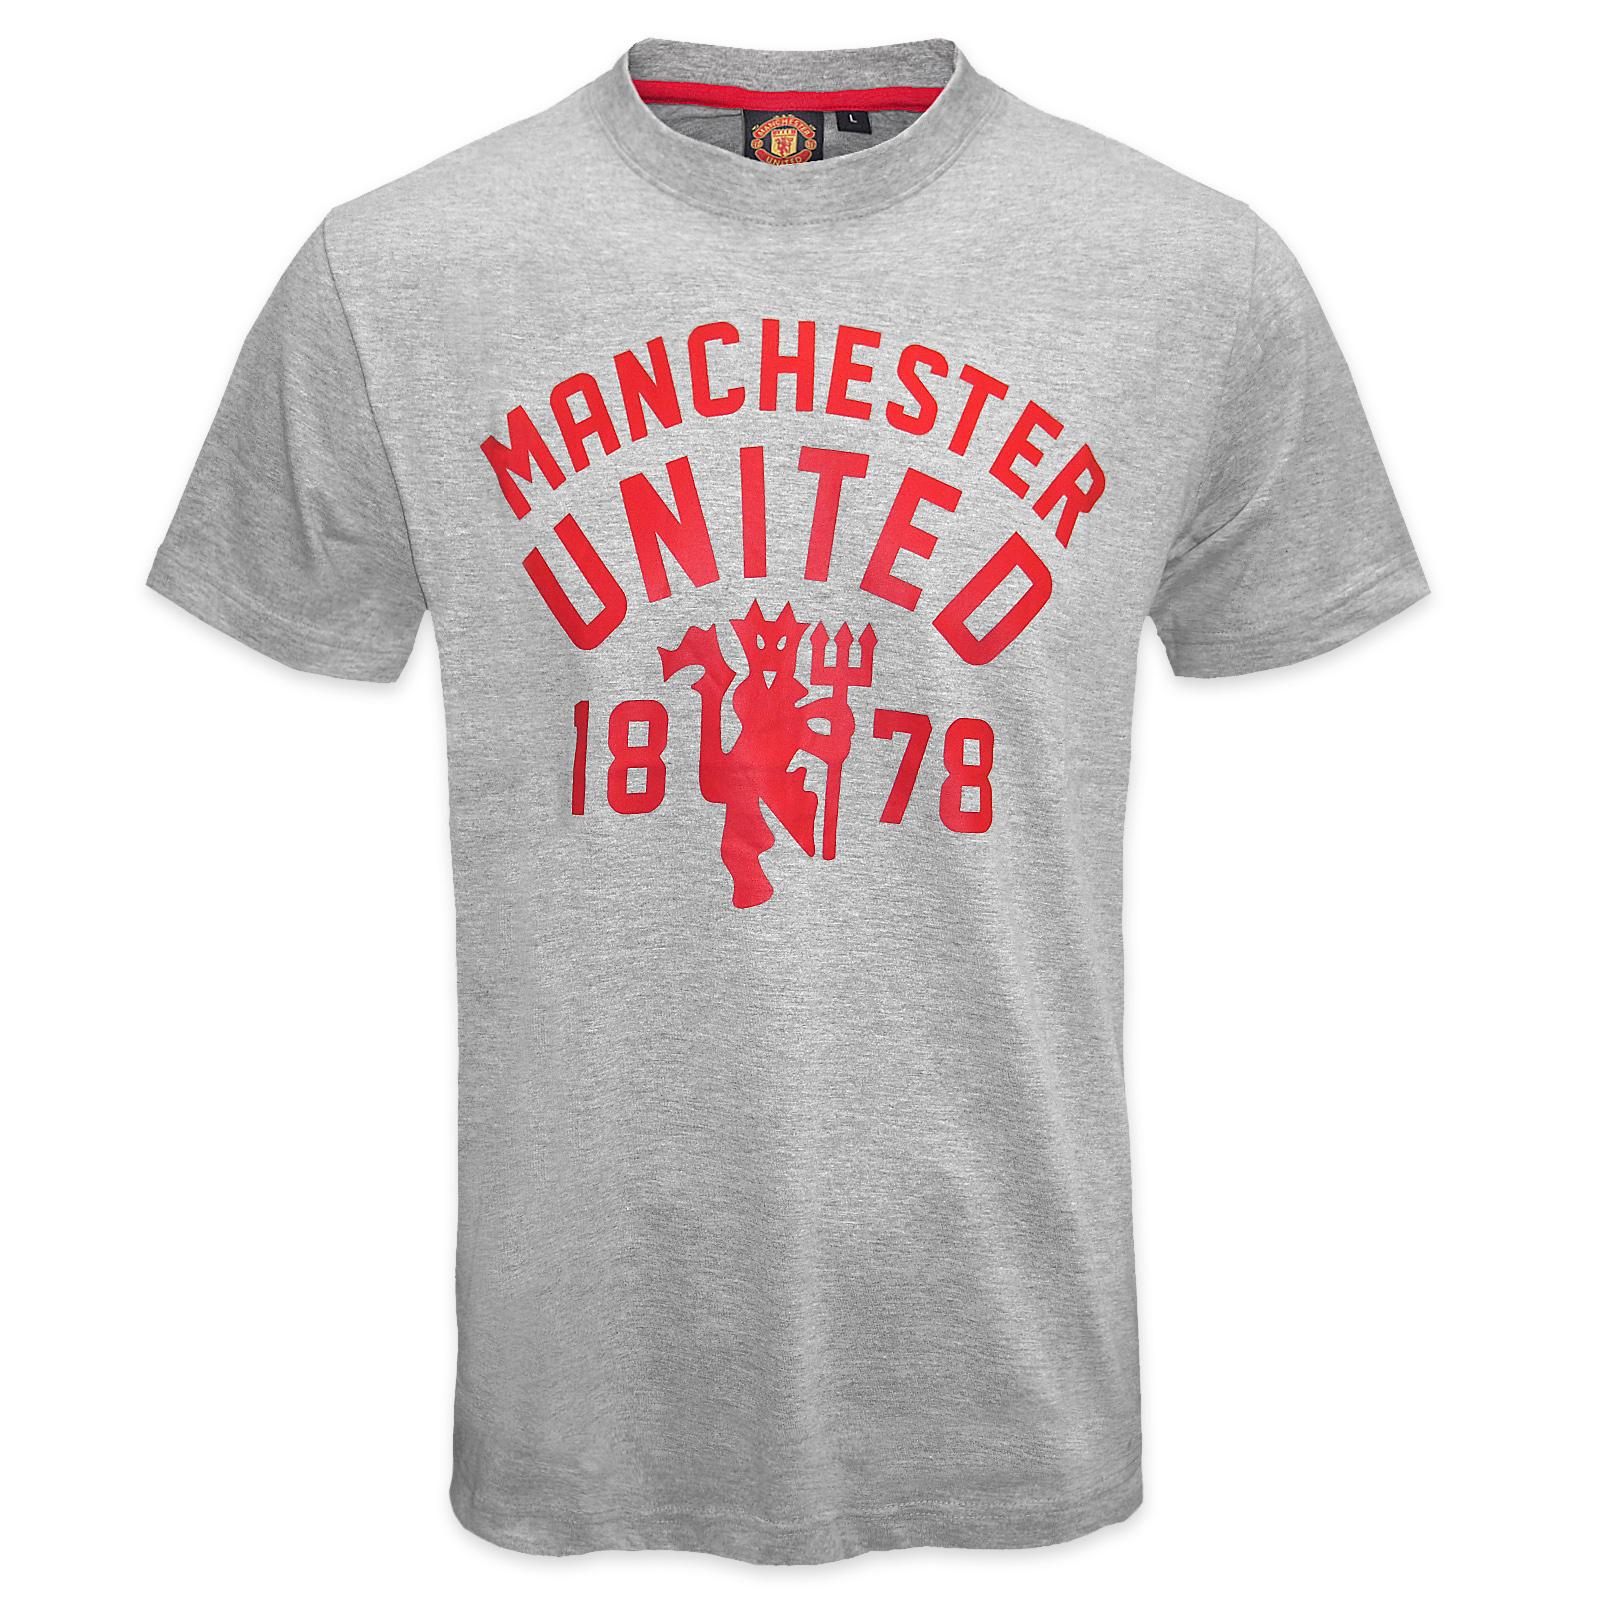 thumbnail 3 - Manchester United FC Official Football Gift Mens Devil T-Shirt